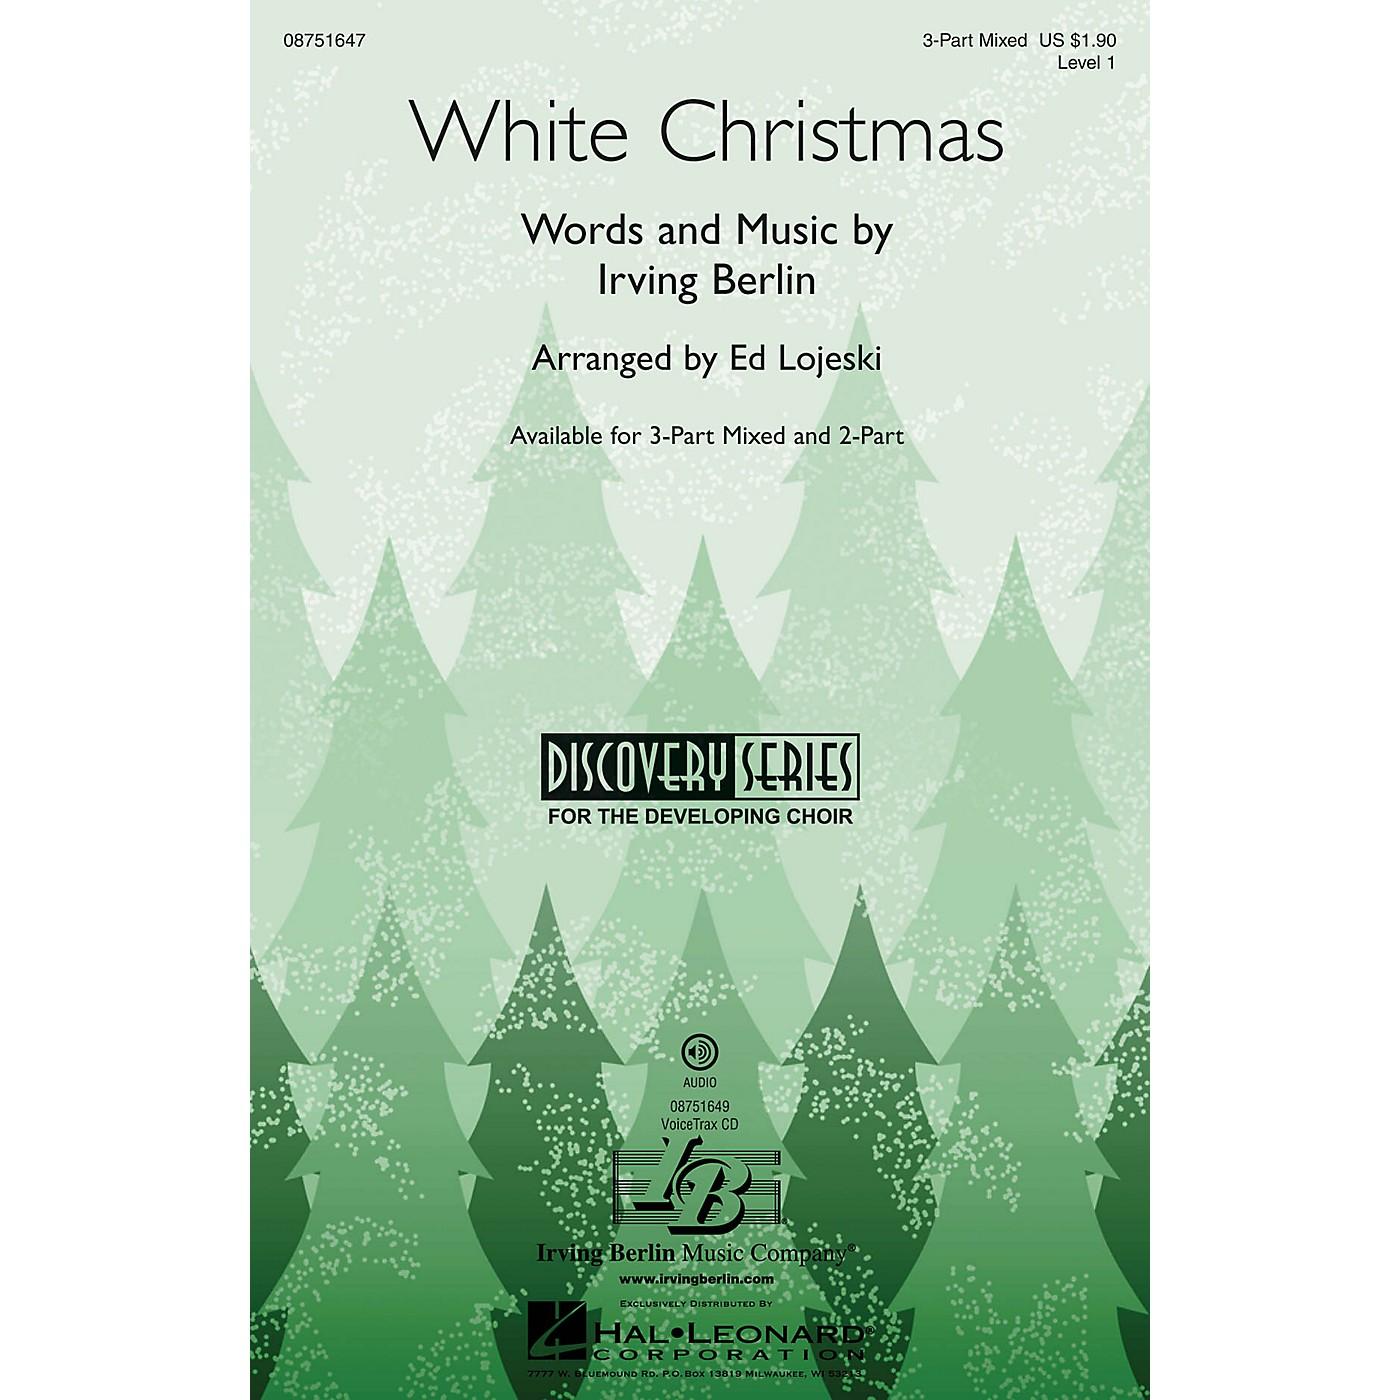 Hal Leonard White Christmas (Discovery Level 1) 2-Part Arranged by Ed Lojeski thumbnail